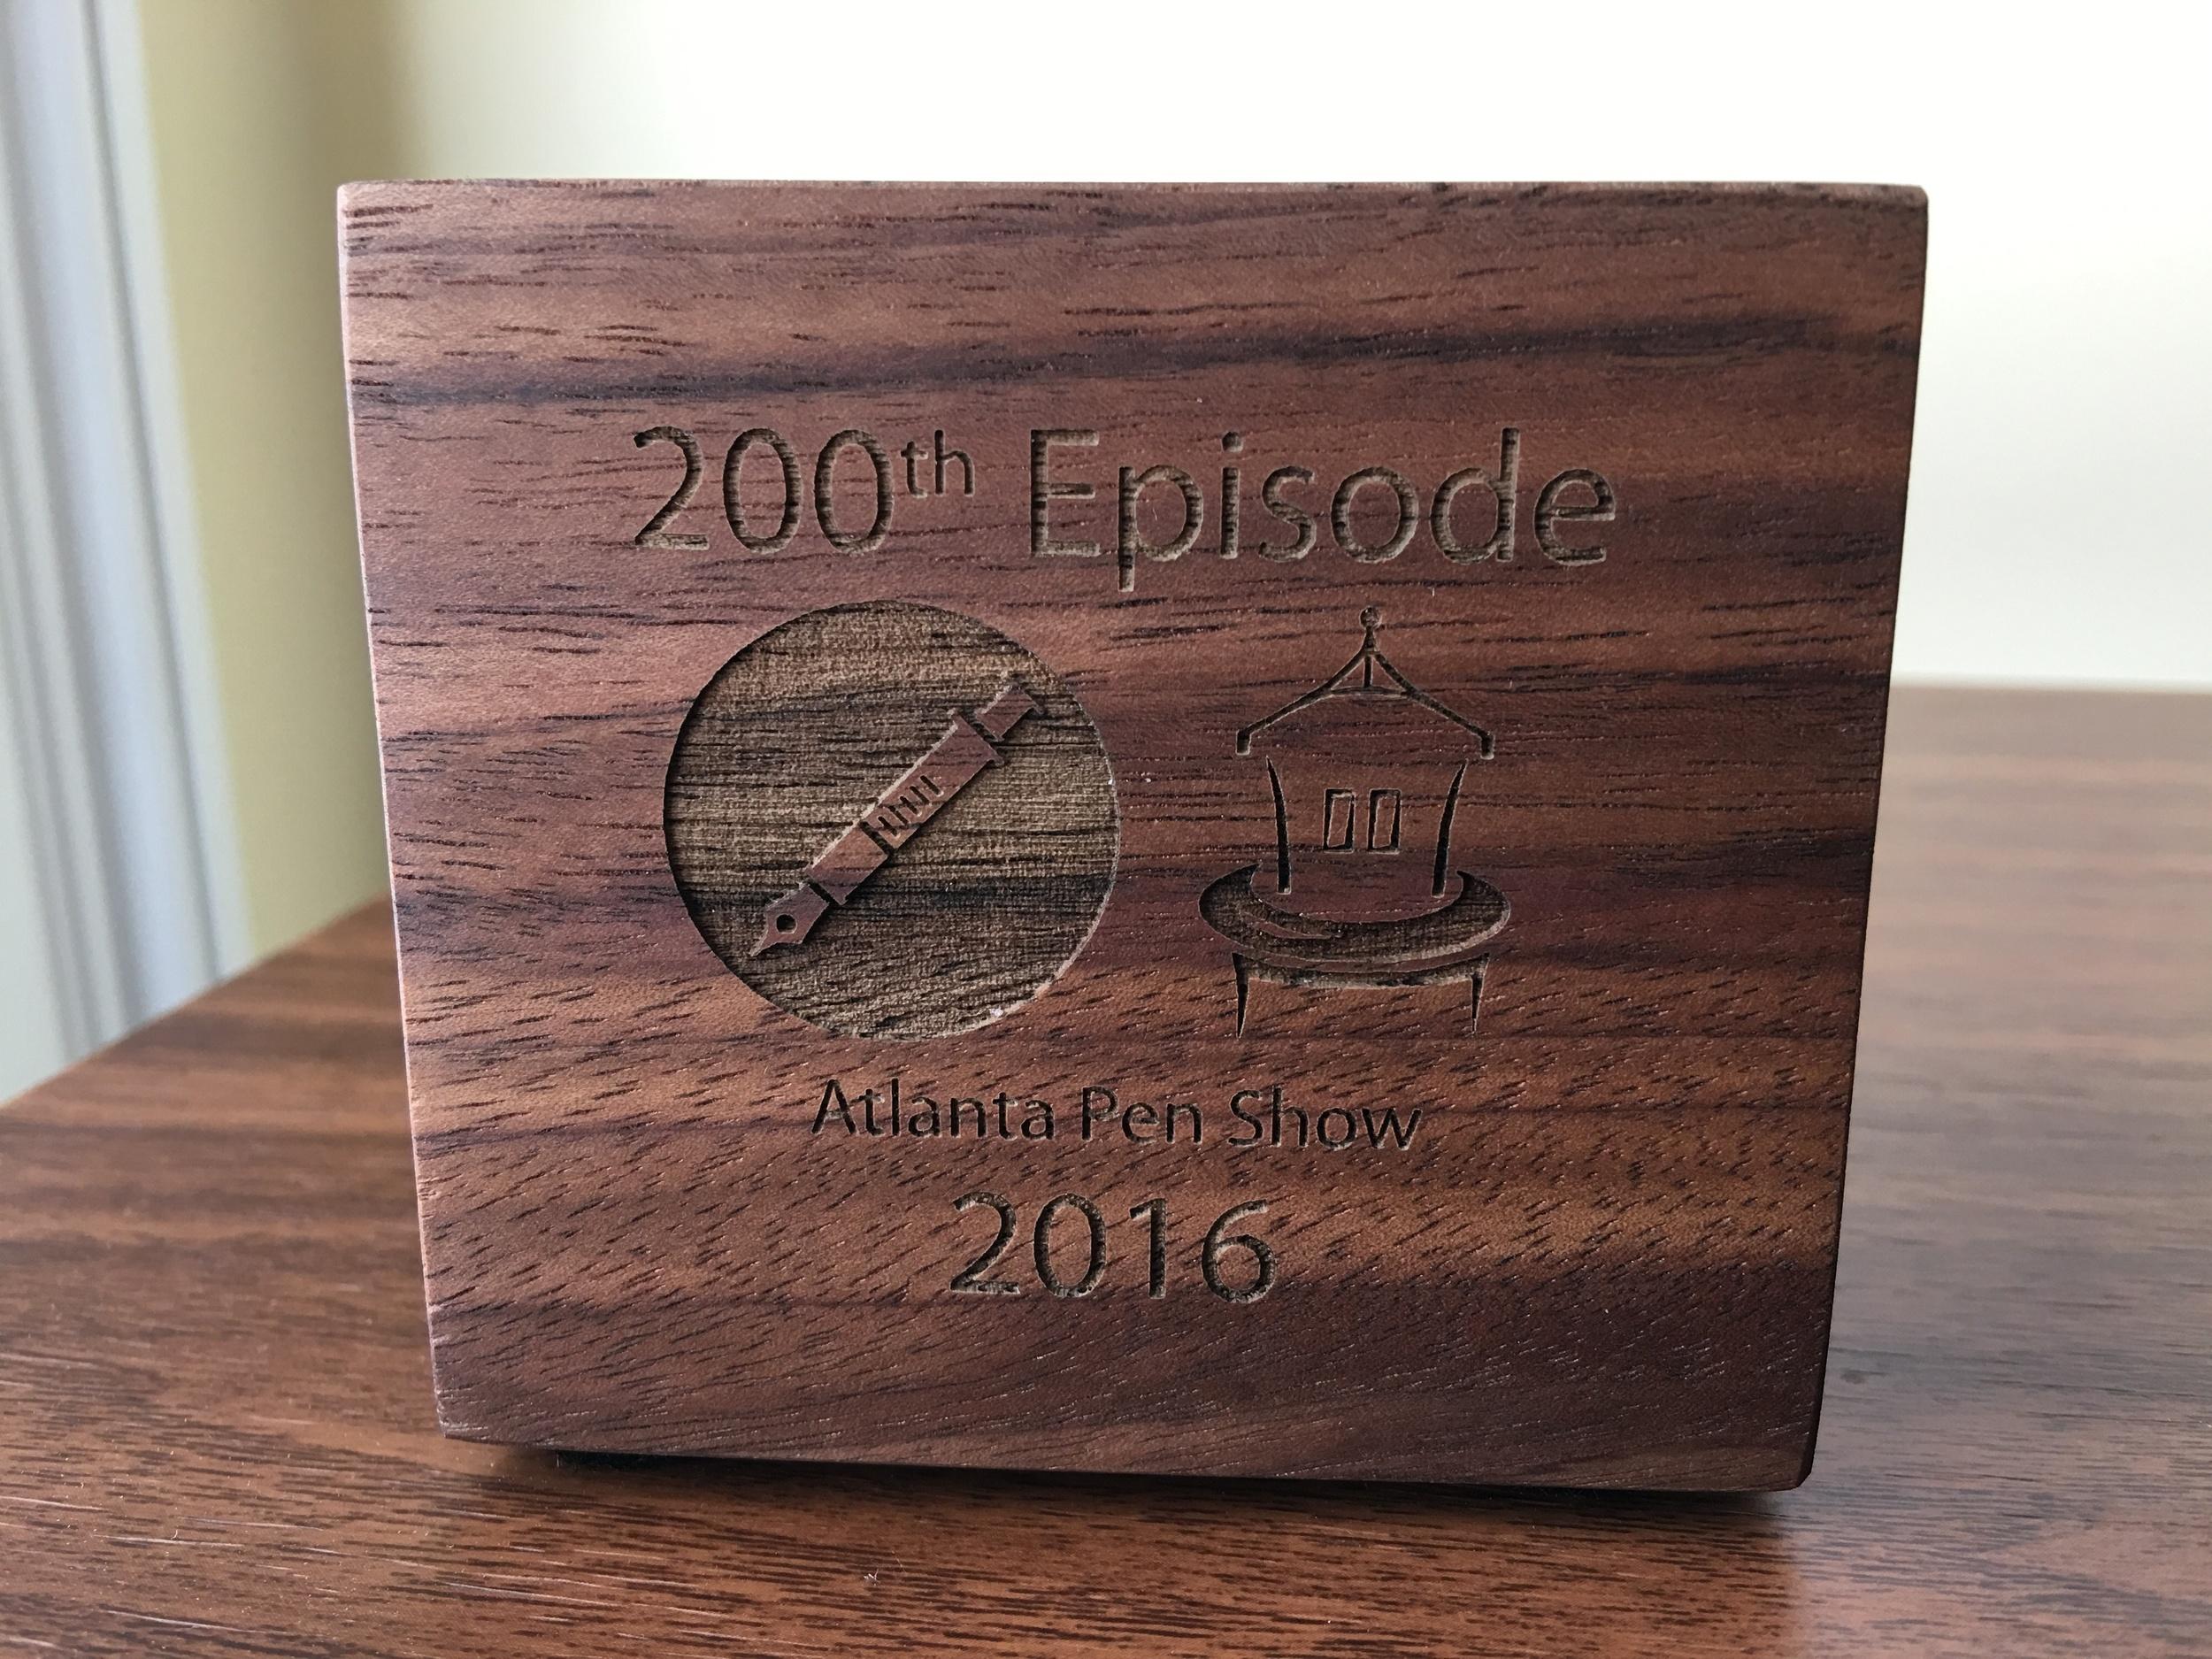 My 200th Episode/Atlanta Pen Show Commemorative Dudek Cube.